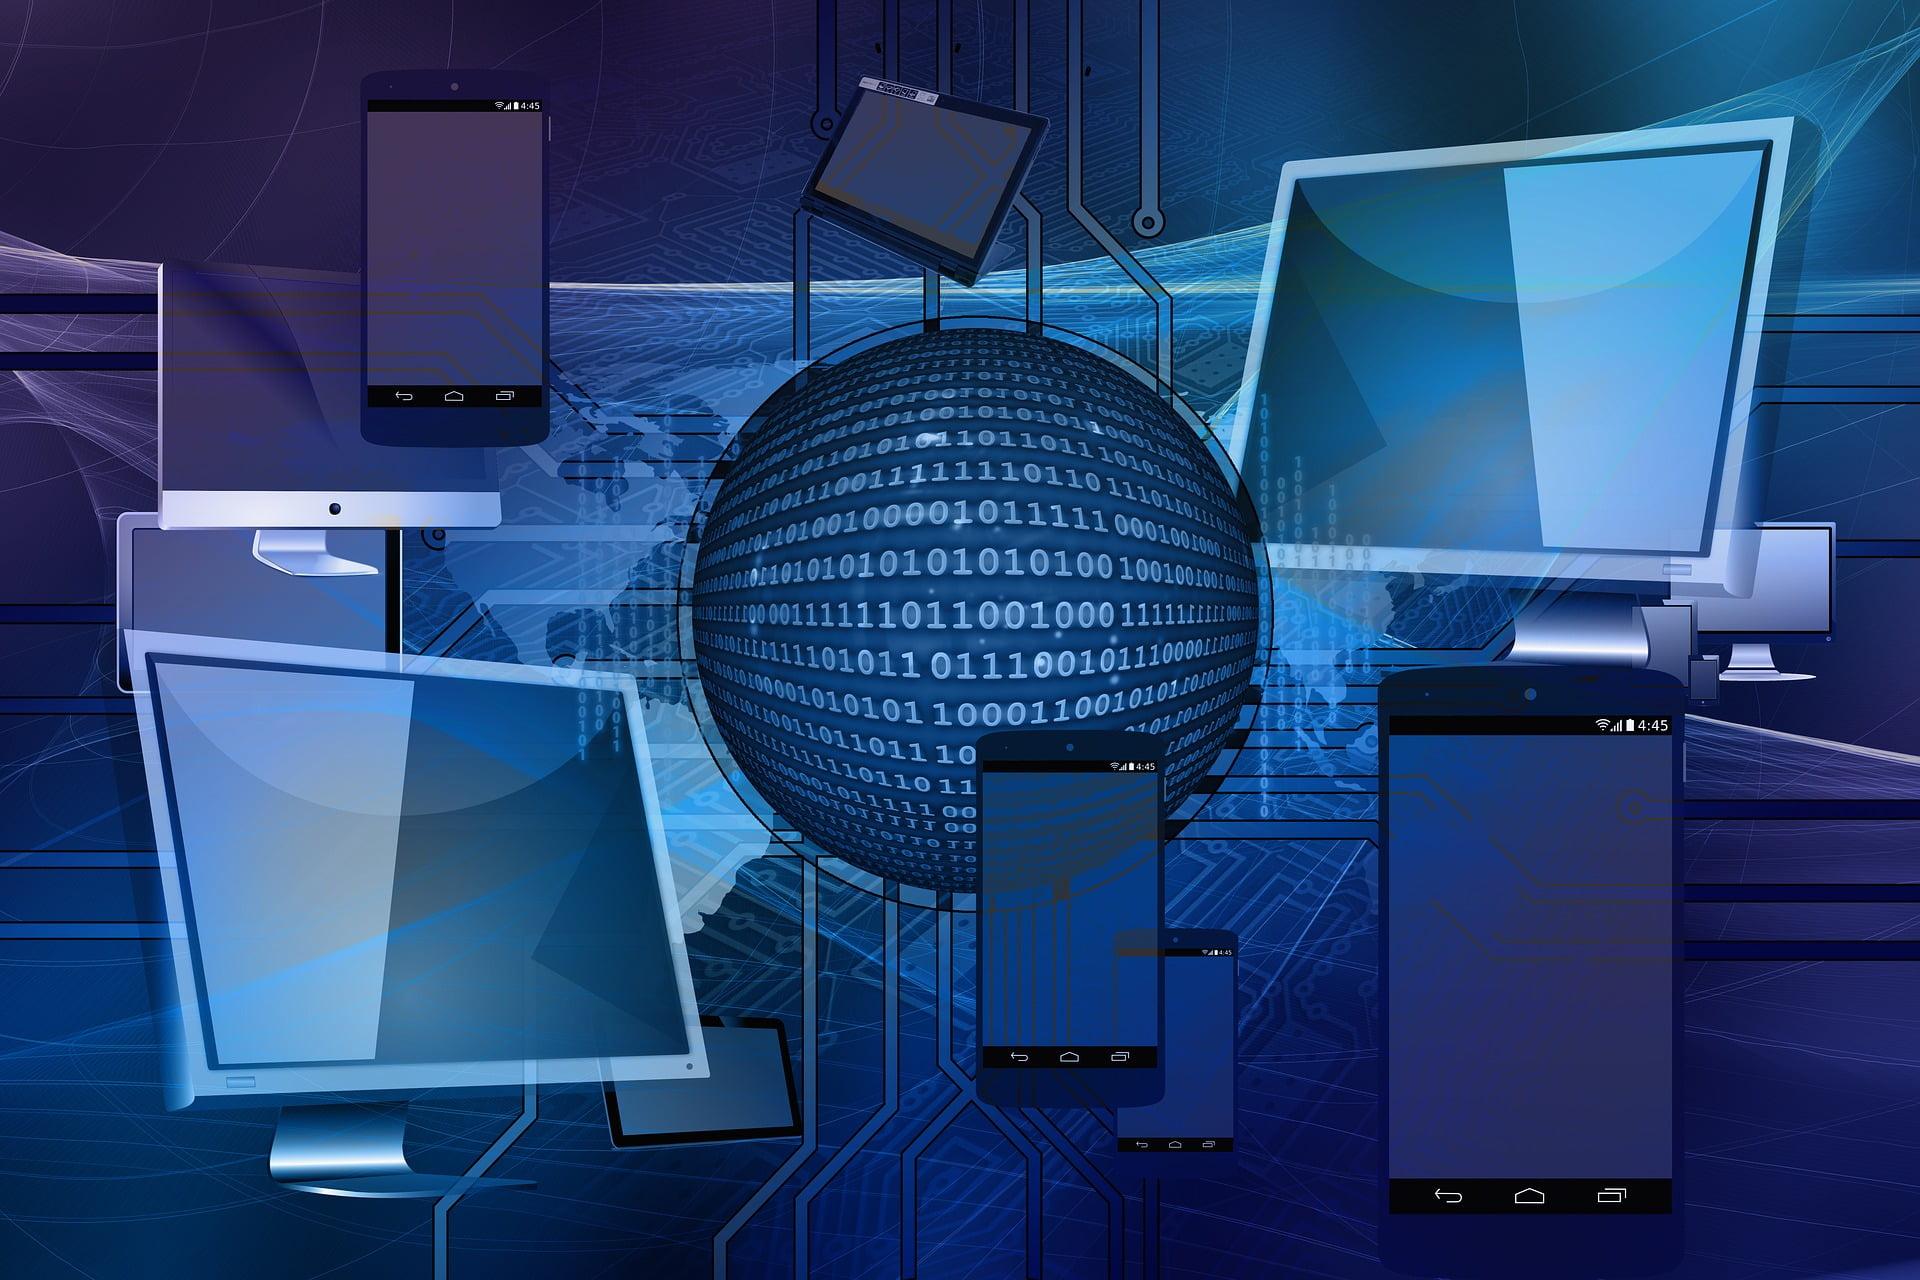 SolusVM vs Virtualizor | Comparison of the Two VPS Control Panel